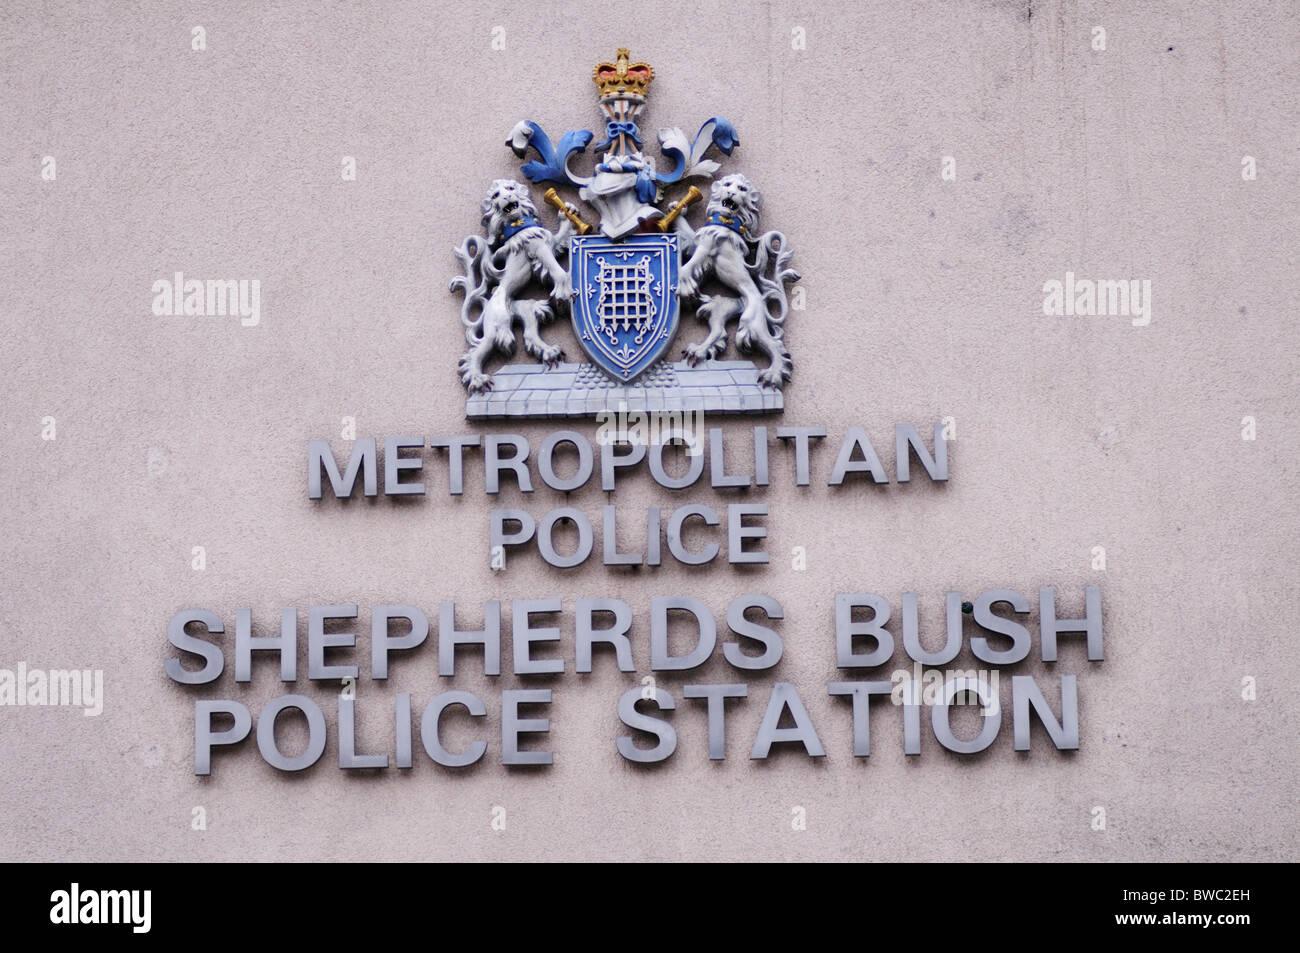 Metropolitan Police Shepherds Bush Police Station Sign, London, England, UK - Stock Image